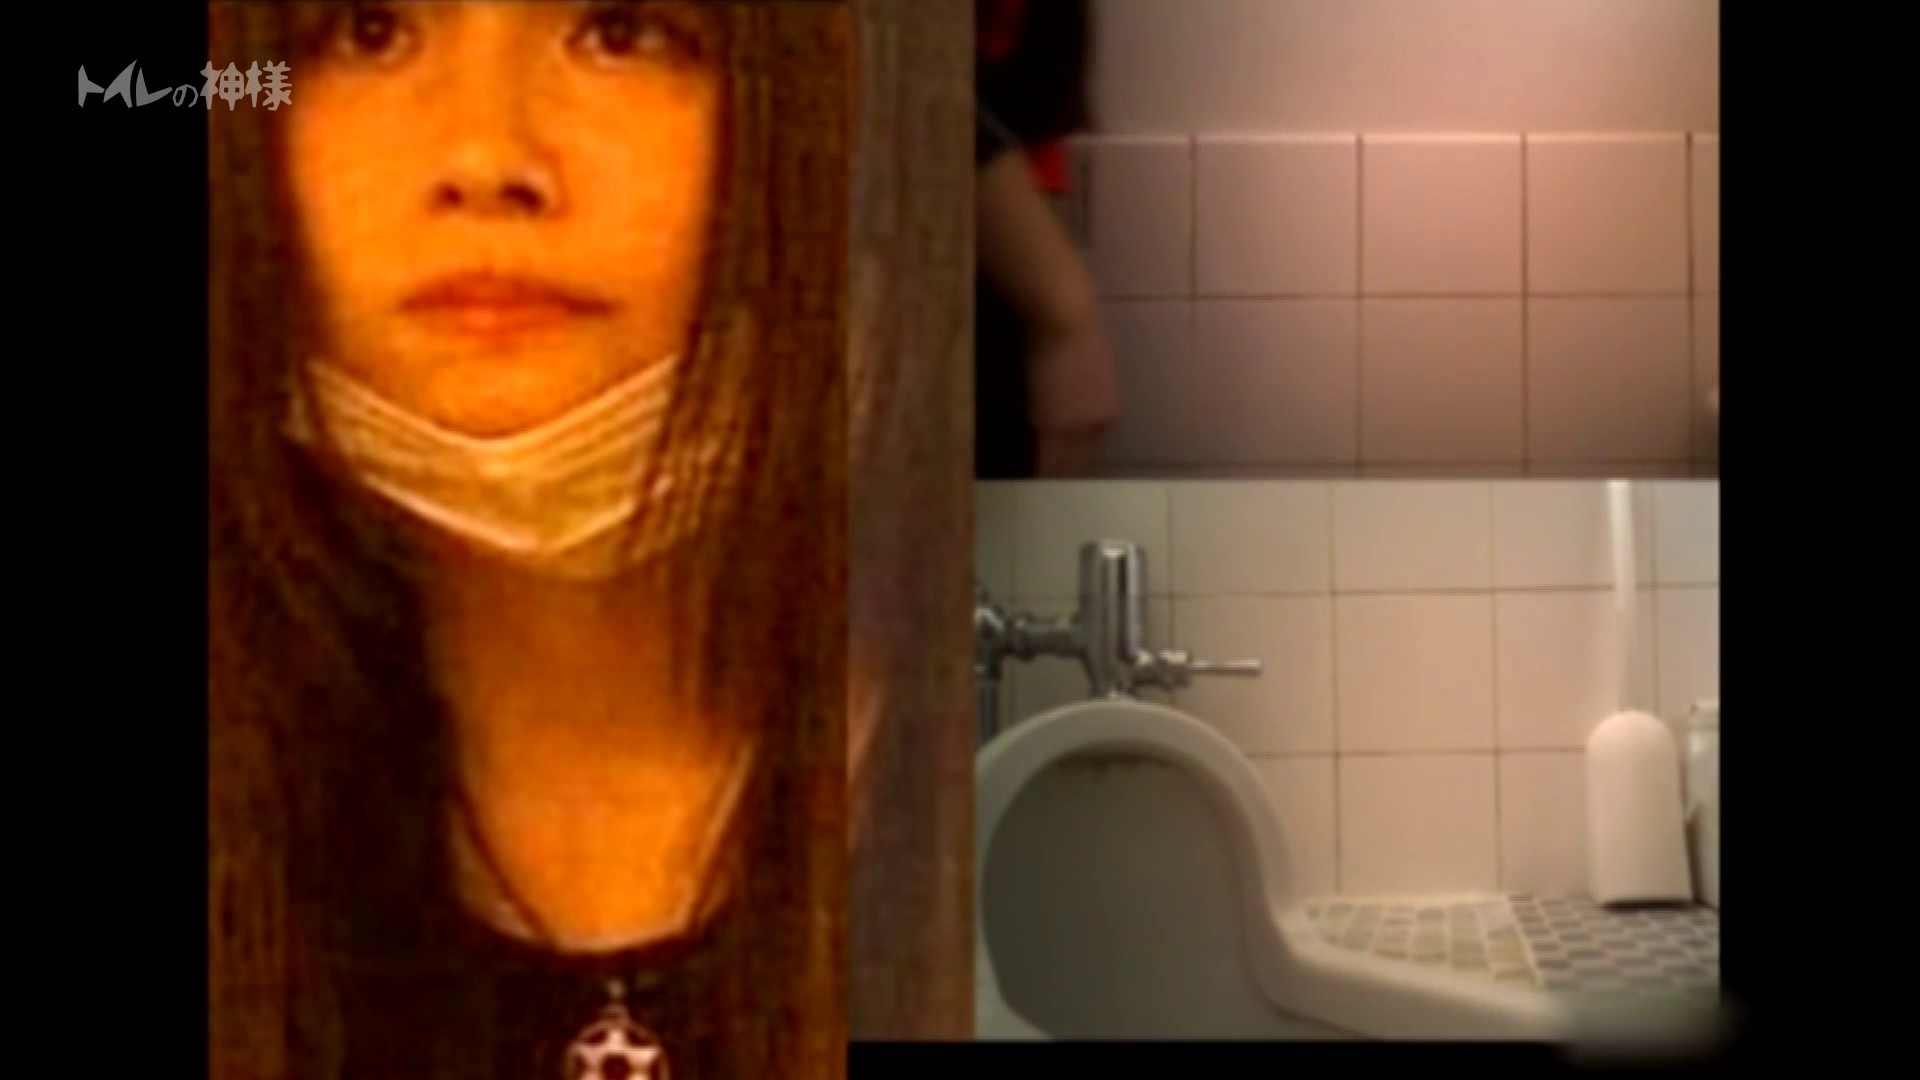 Vol.02 花の女子大生うんこ盗撮2 トイレ中 | 盗撮エロすぎ  34連発 27